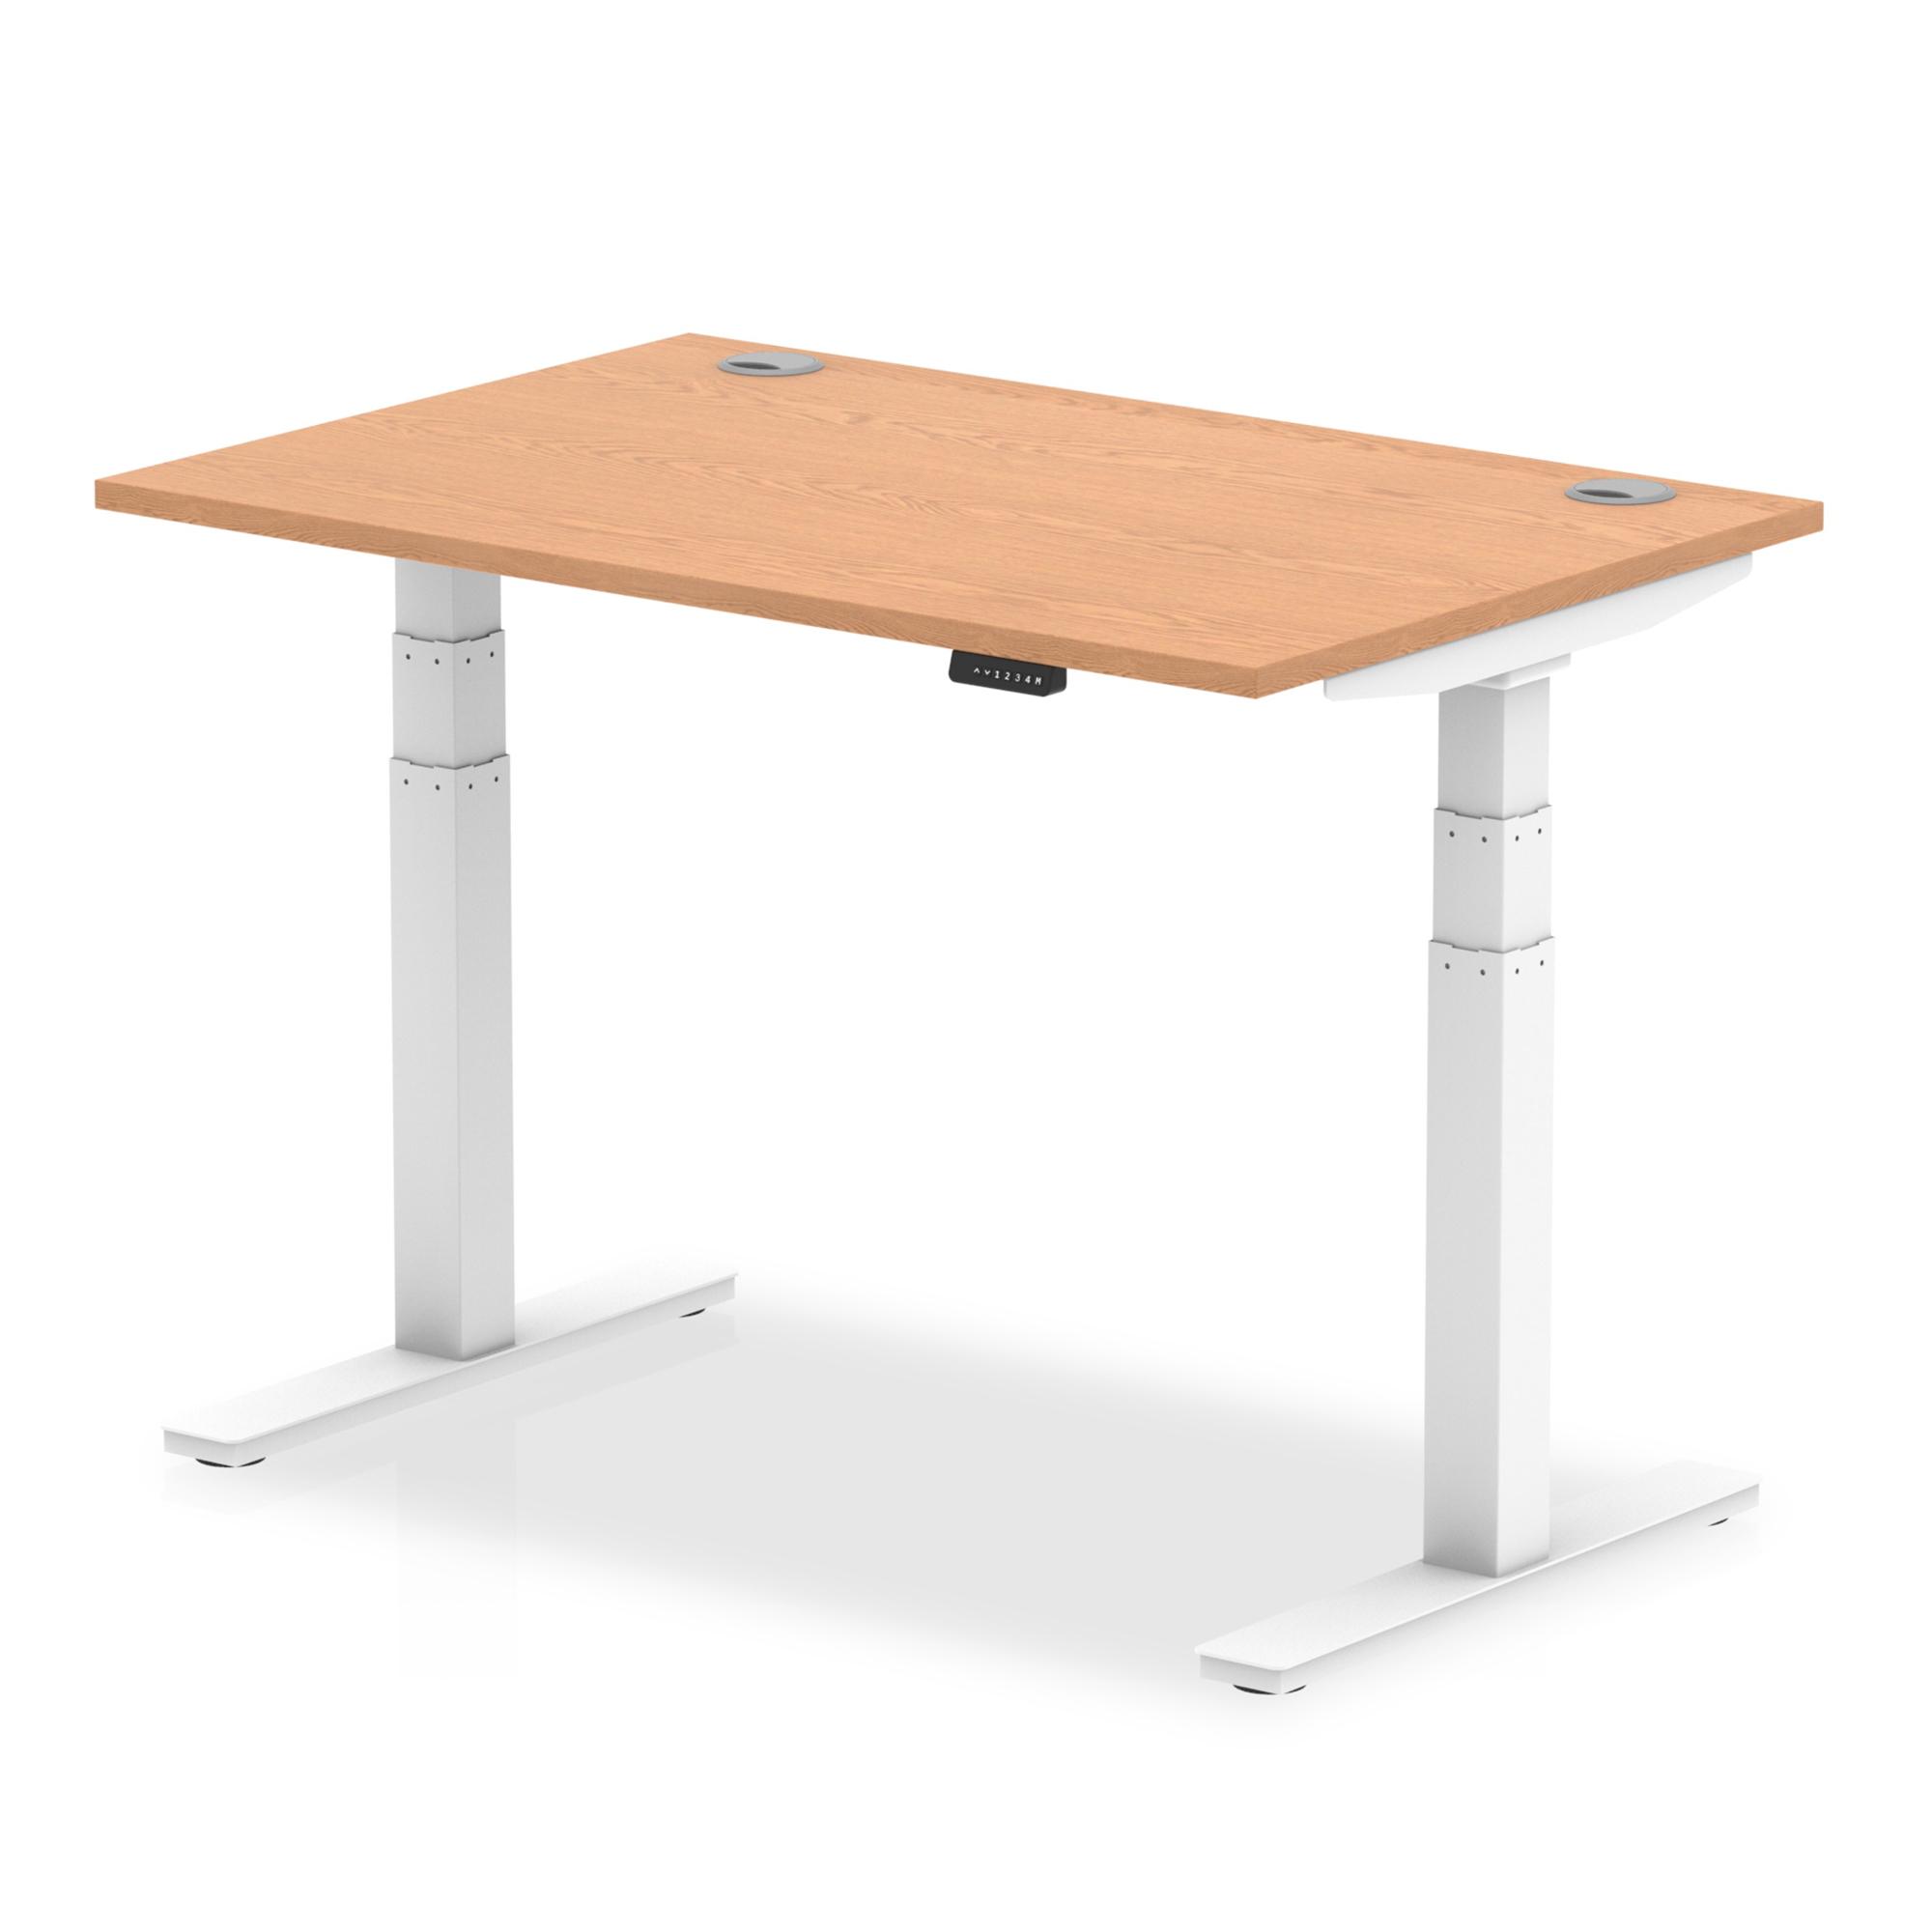 Trexus Sit Stand Desk With Cable Ports White Legs 1200x800mm Oak Ref HA01117